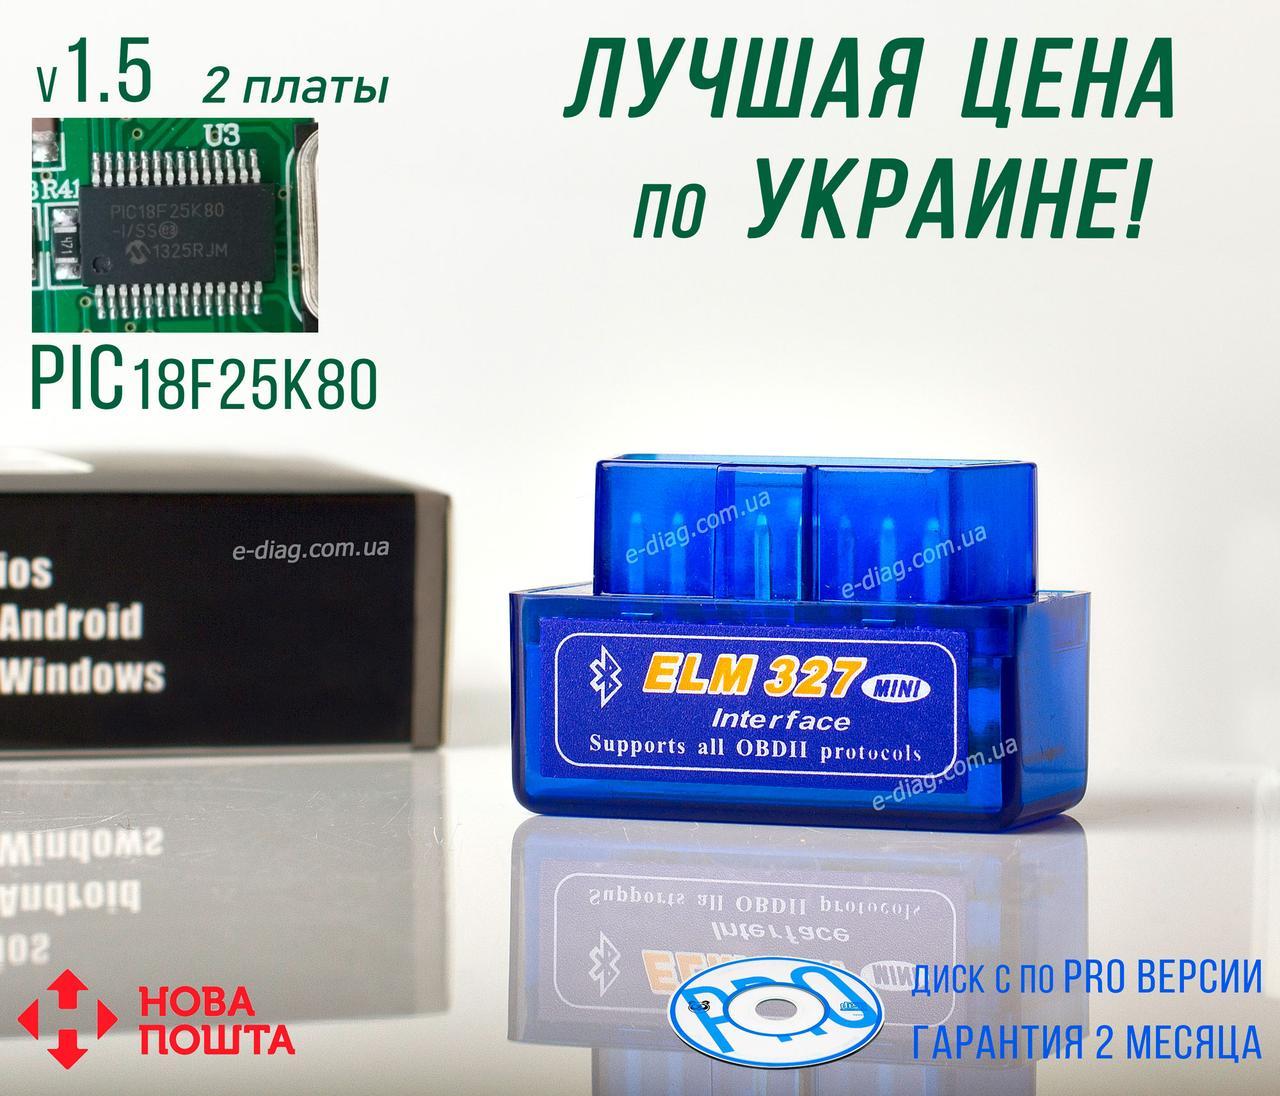 Автосканер ELM327 OBD2 v1.5 Bluetooth на 2 платы (PIC18F25K80) (Полная версия)